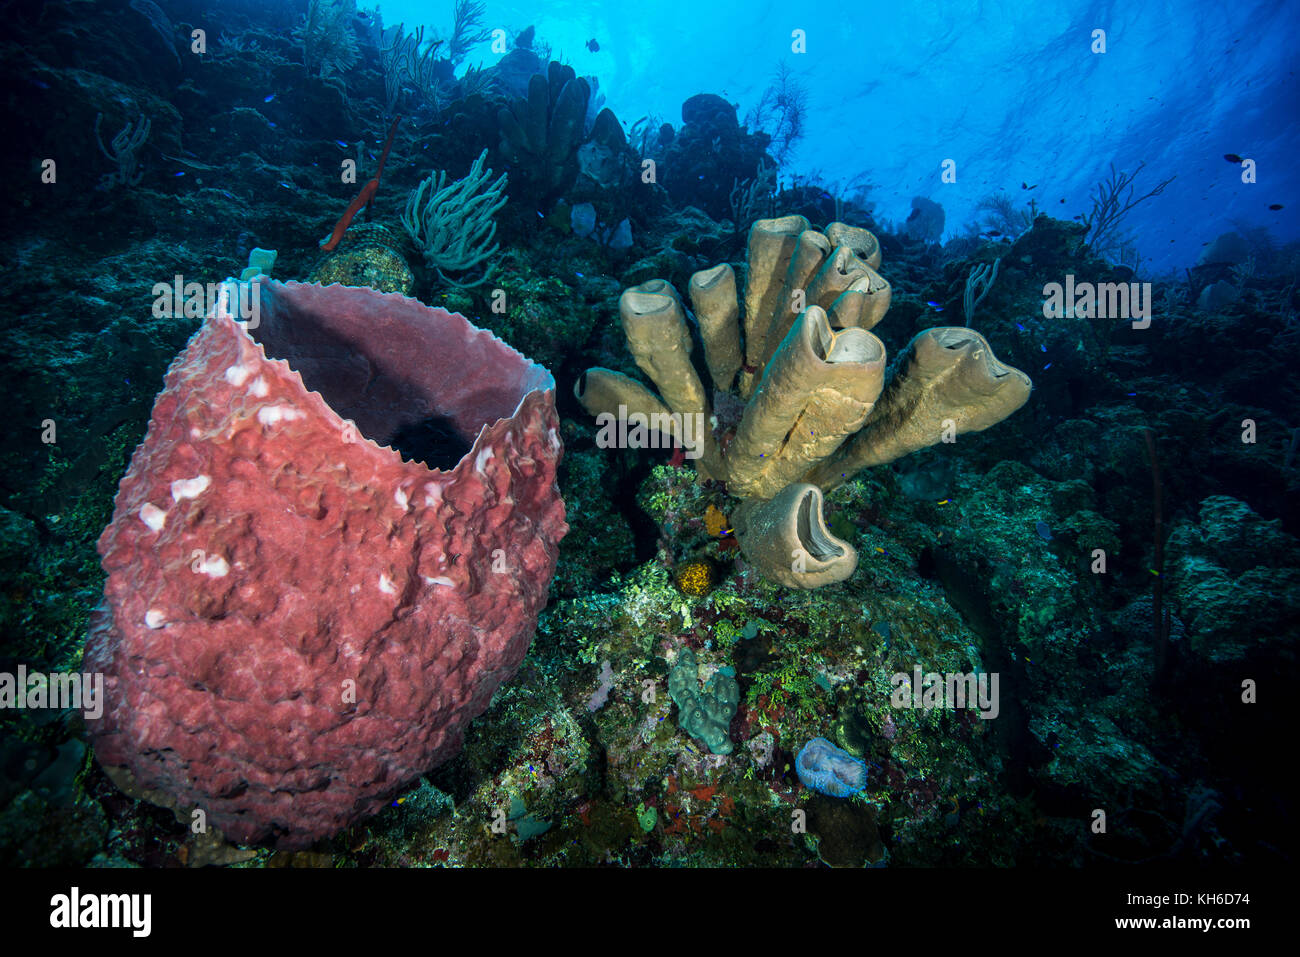 Marine sponge stock photos marine sponge stock images alamy underwater seascape and marine sponge at little cayman stock image reviewsmspy